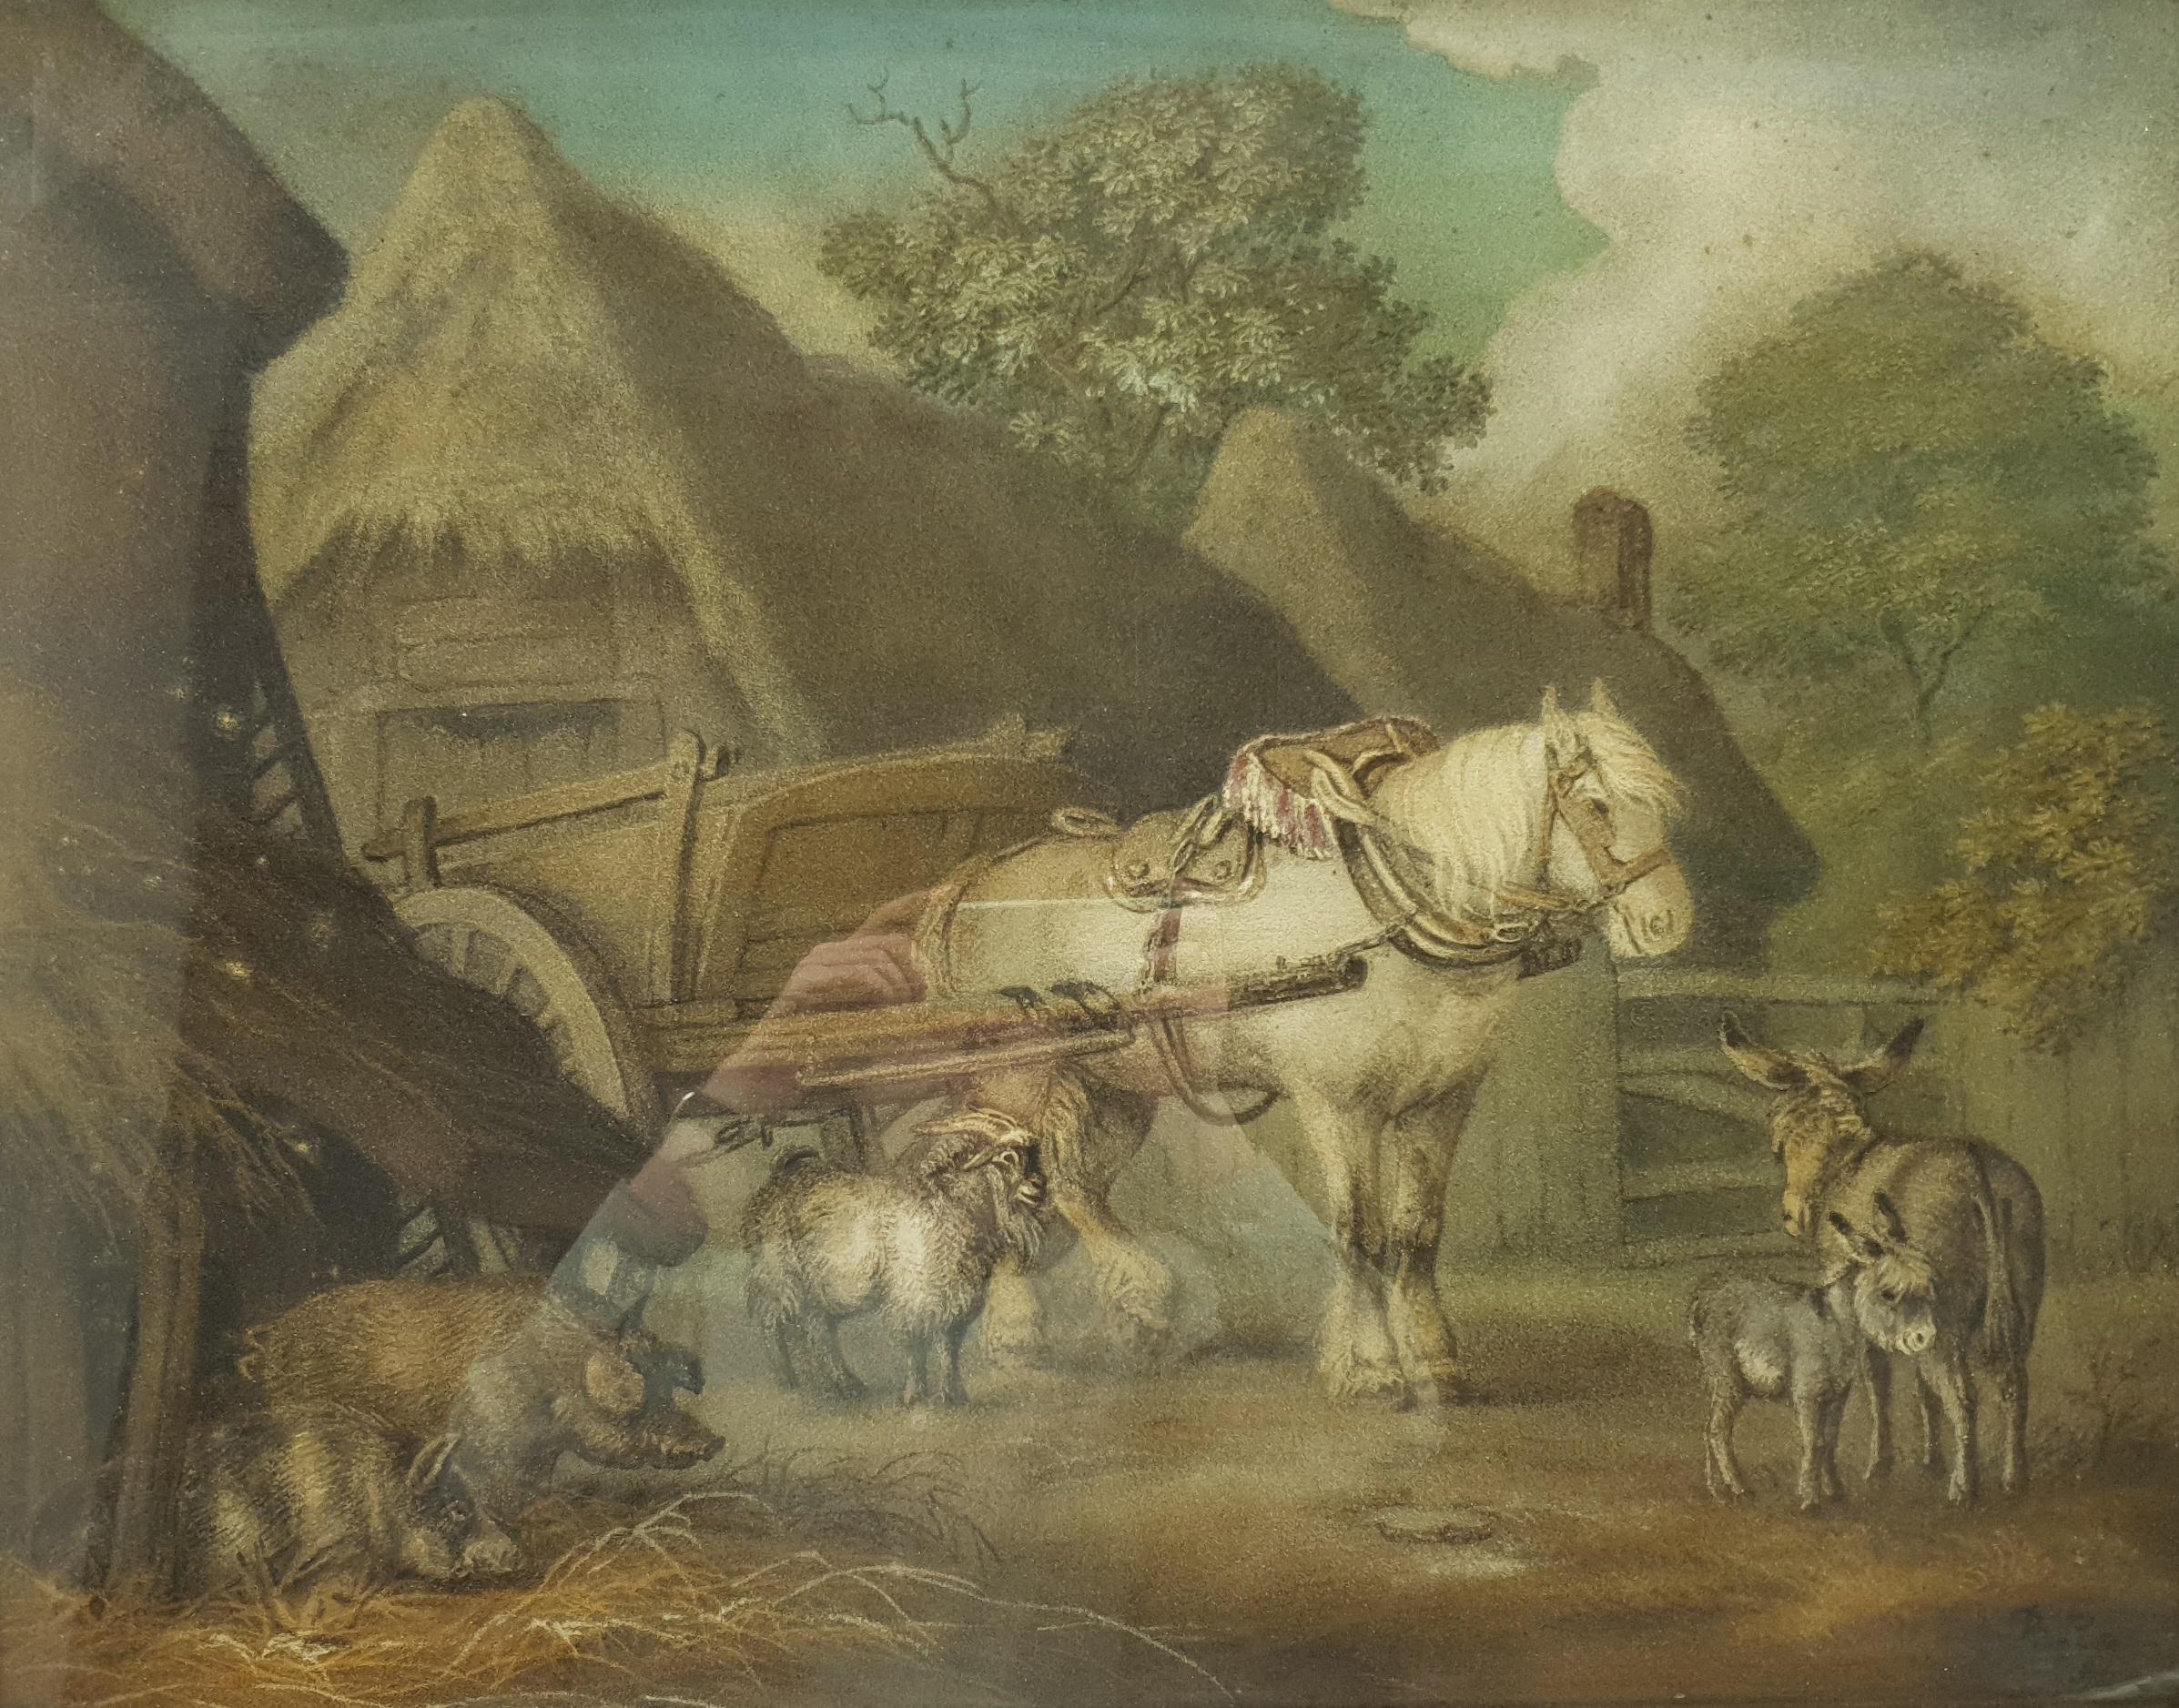 Benjamin Zobel (German/British 1762-1830): Animals in the Farmyard, 'Marmotinto' sand picture signed